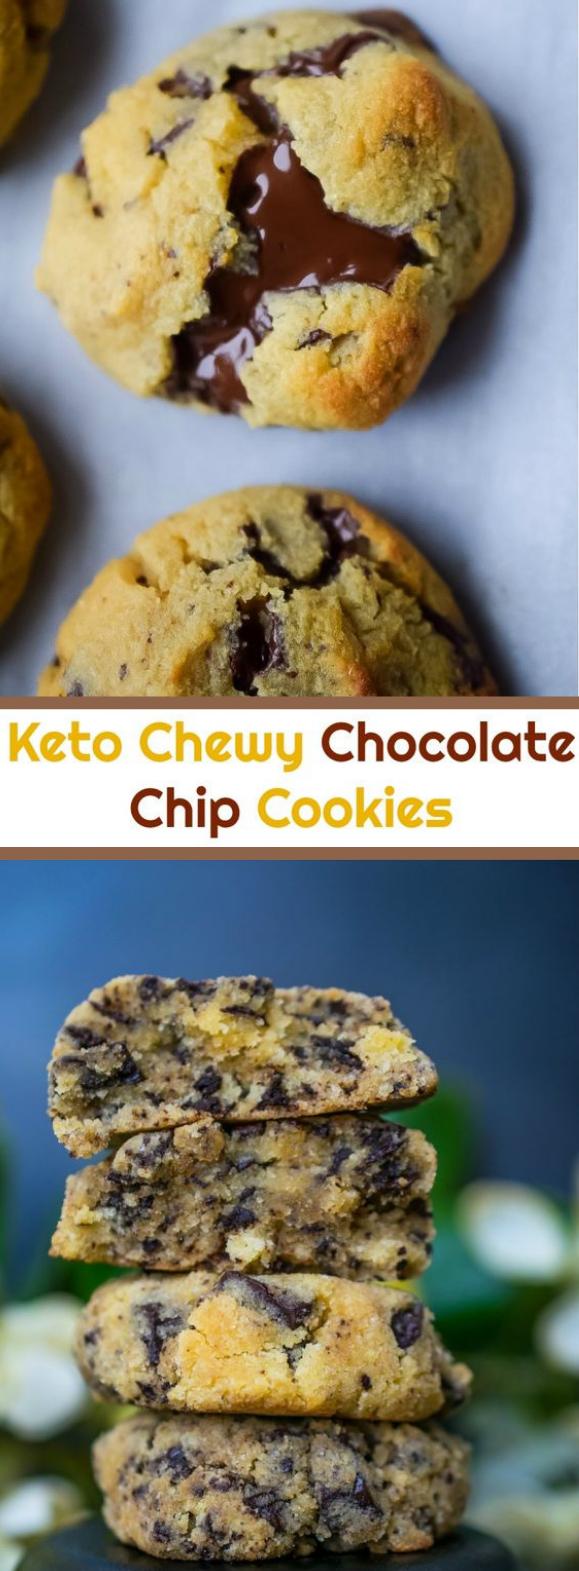 KETO CHEWY CHOCOLATE CHIP COOKIES #keto #dessert